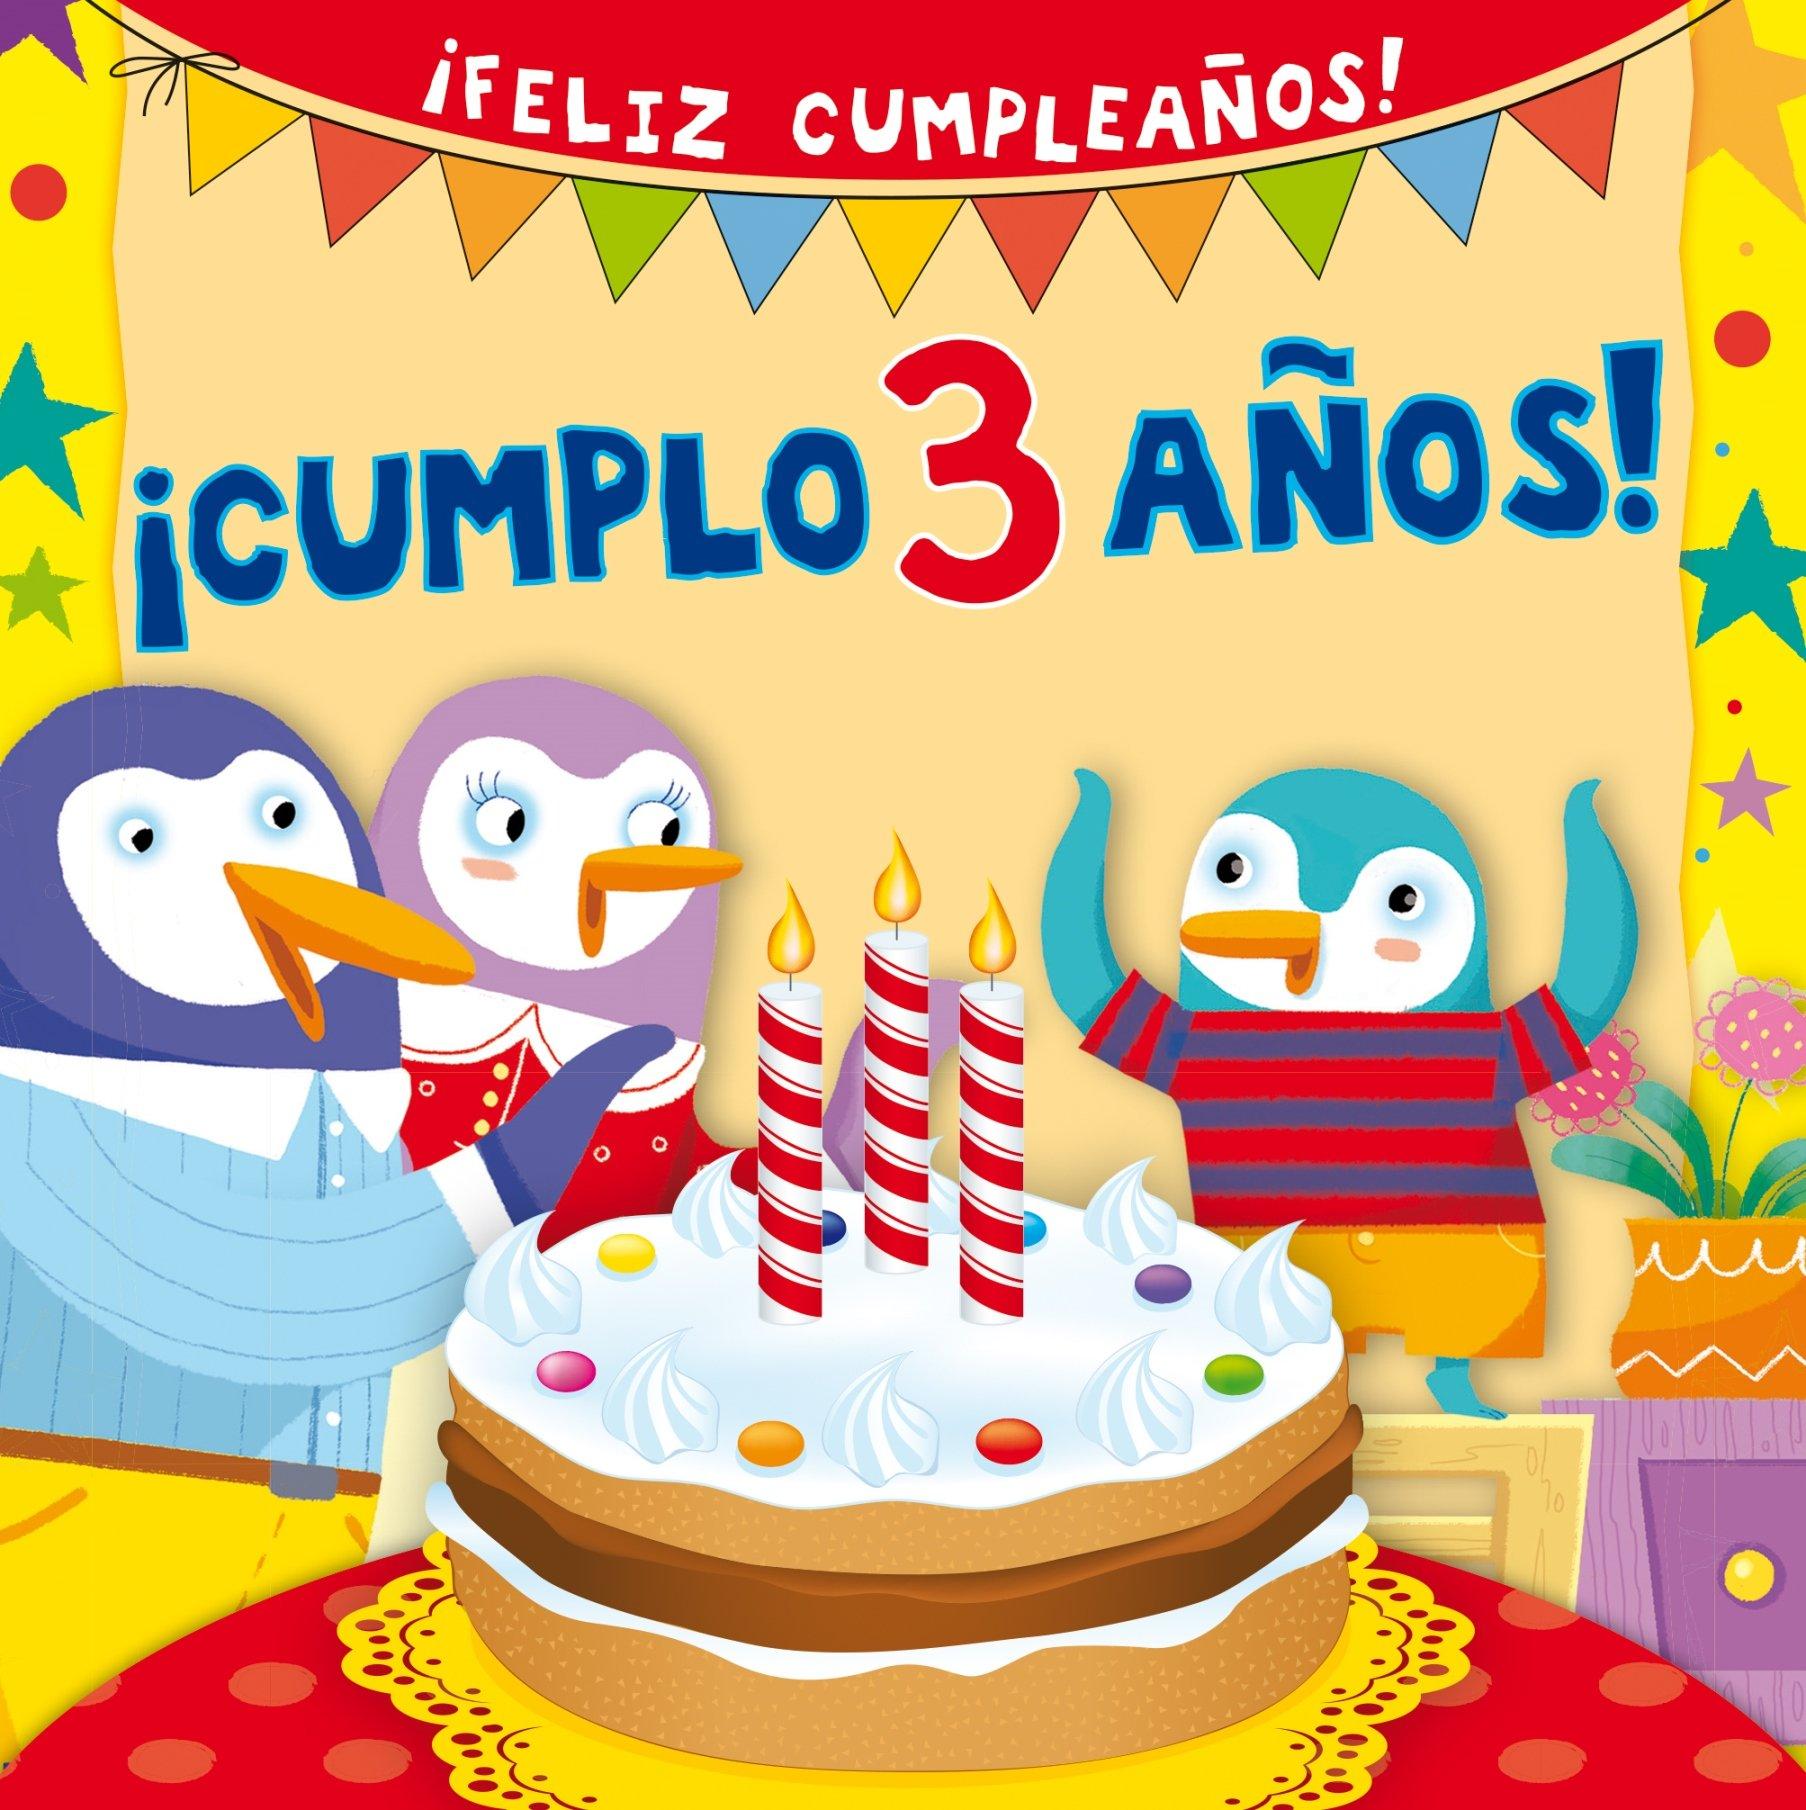 Cumplo 3 anos! (Spanish Edition): Silvia DAchille ...